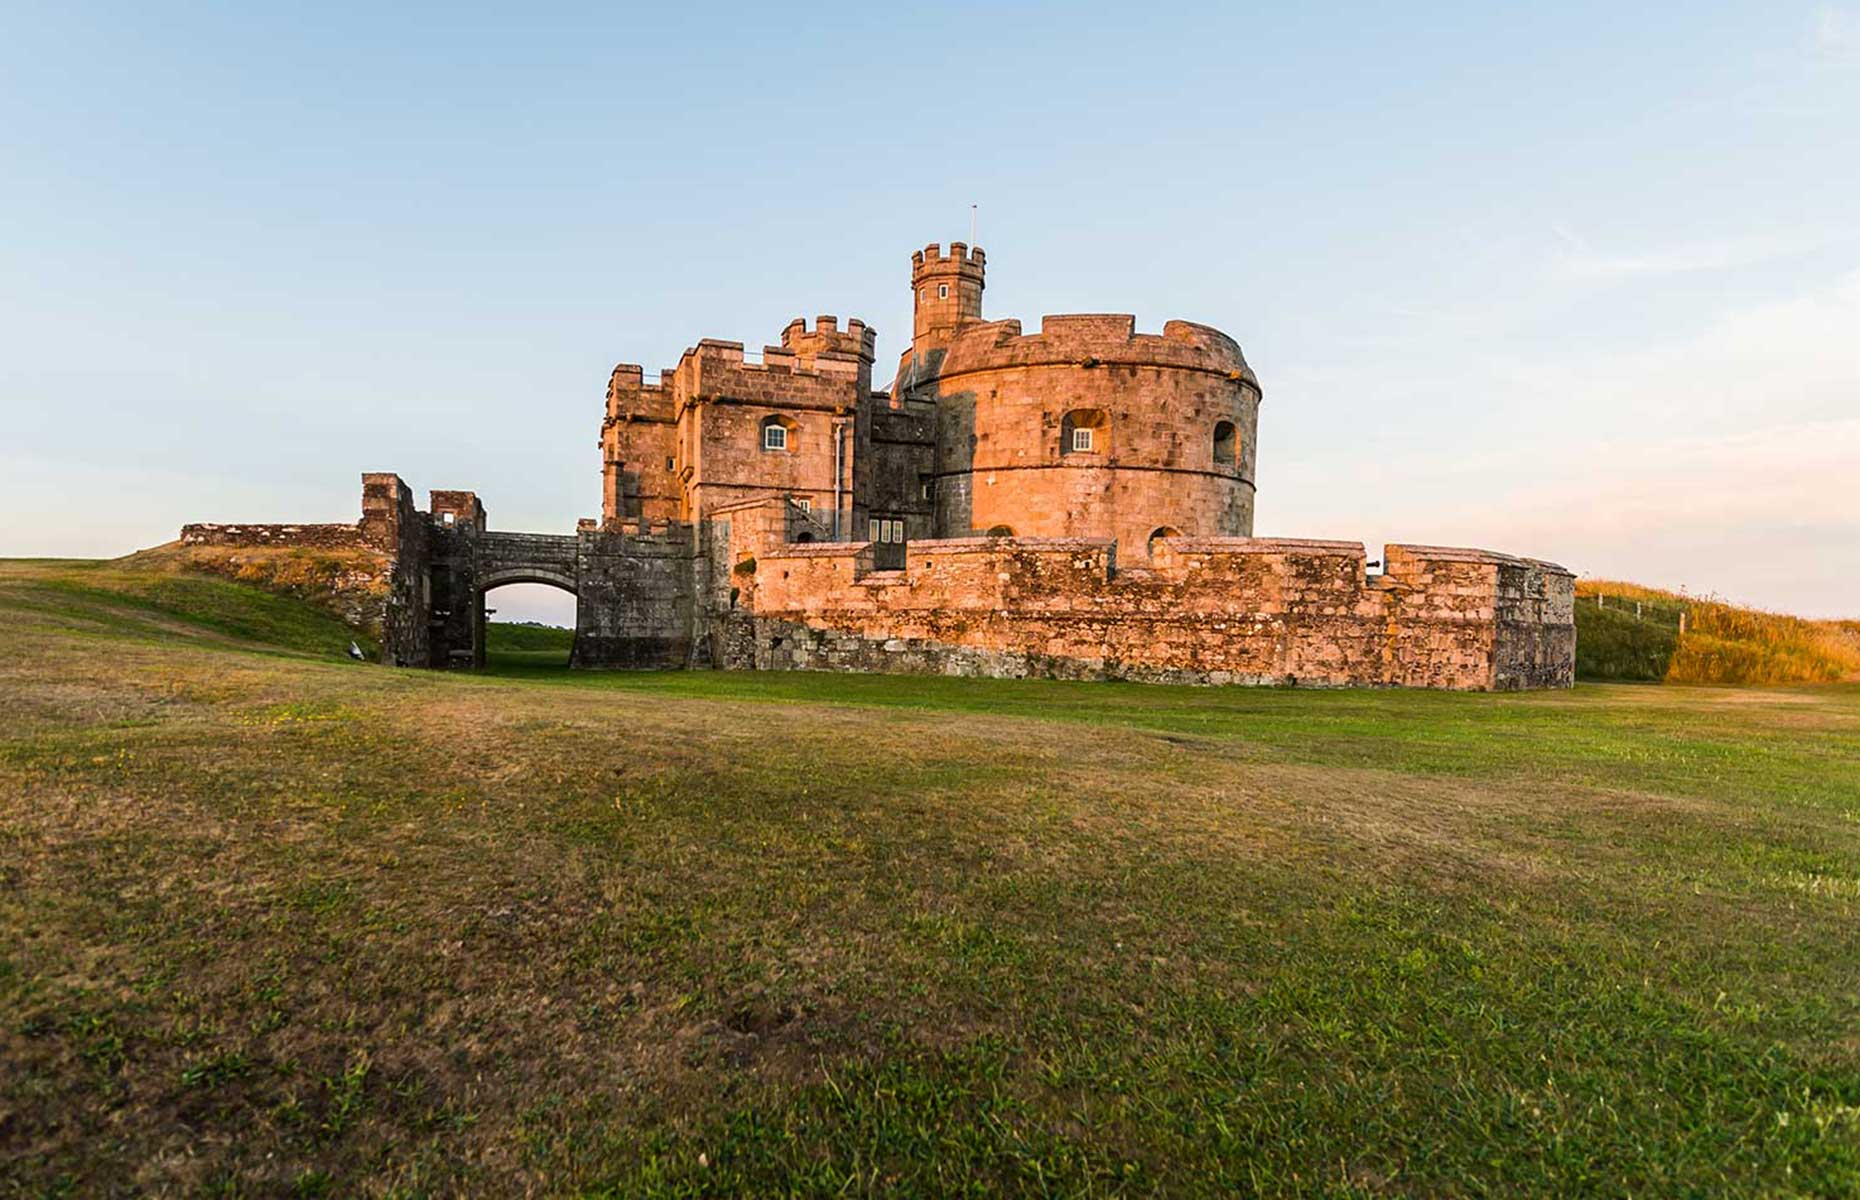 Pendennis Castle, near Falmouth, Cornwall